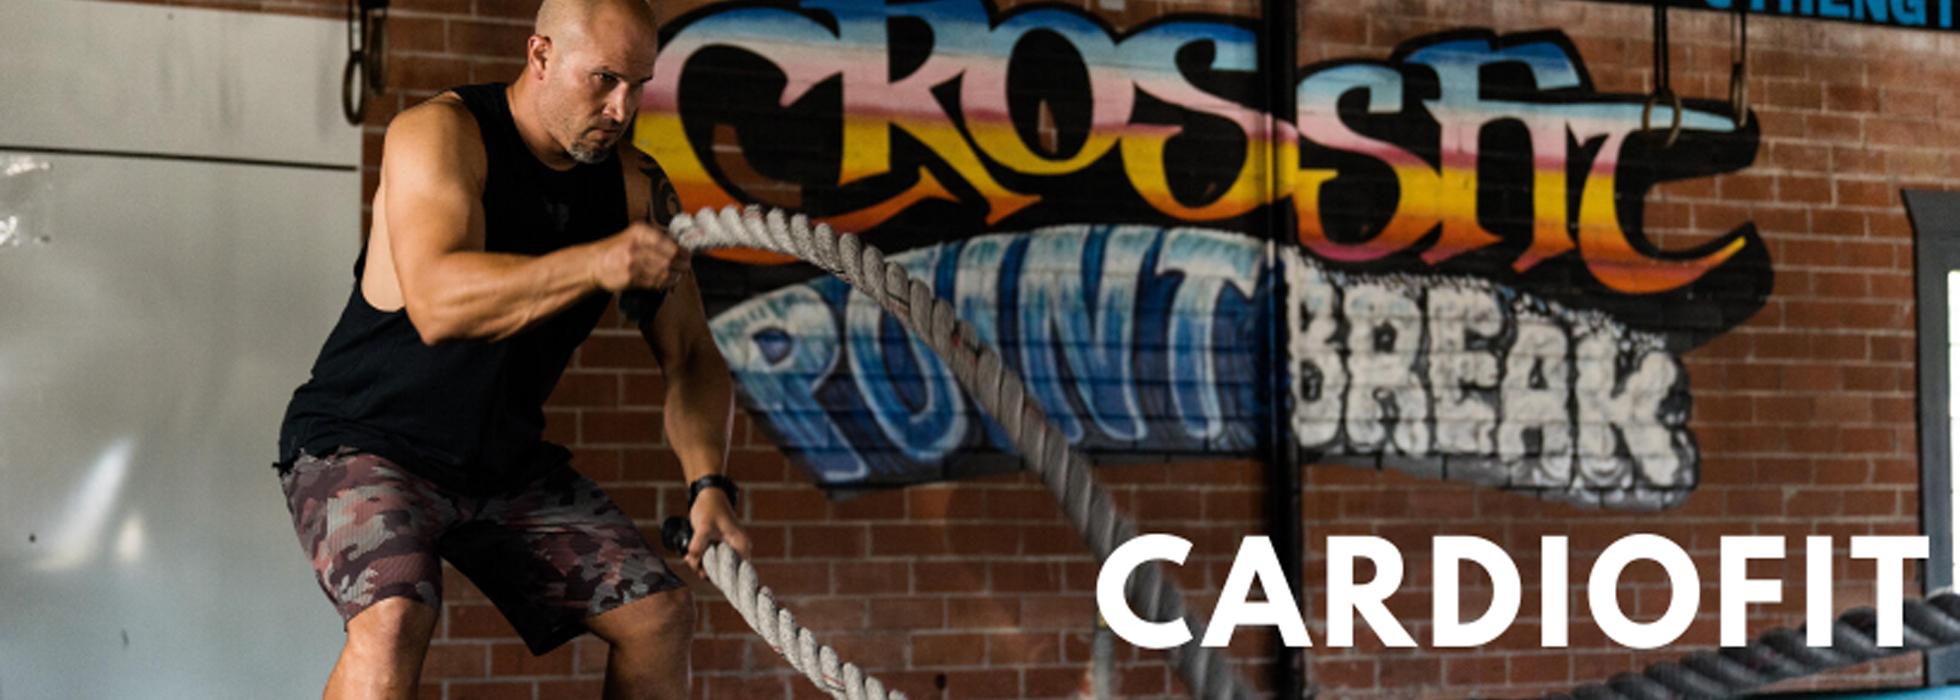 Cardio Fitness in Spring TX, Cardio Fitness near Houston TX